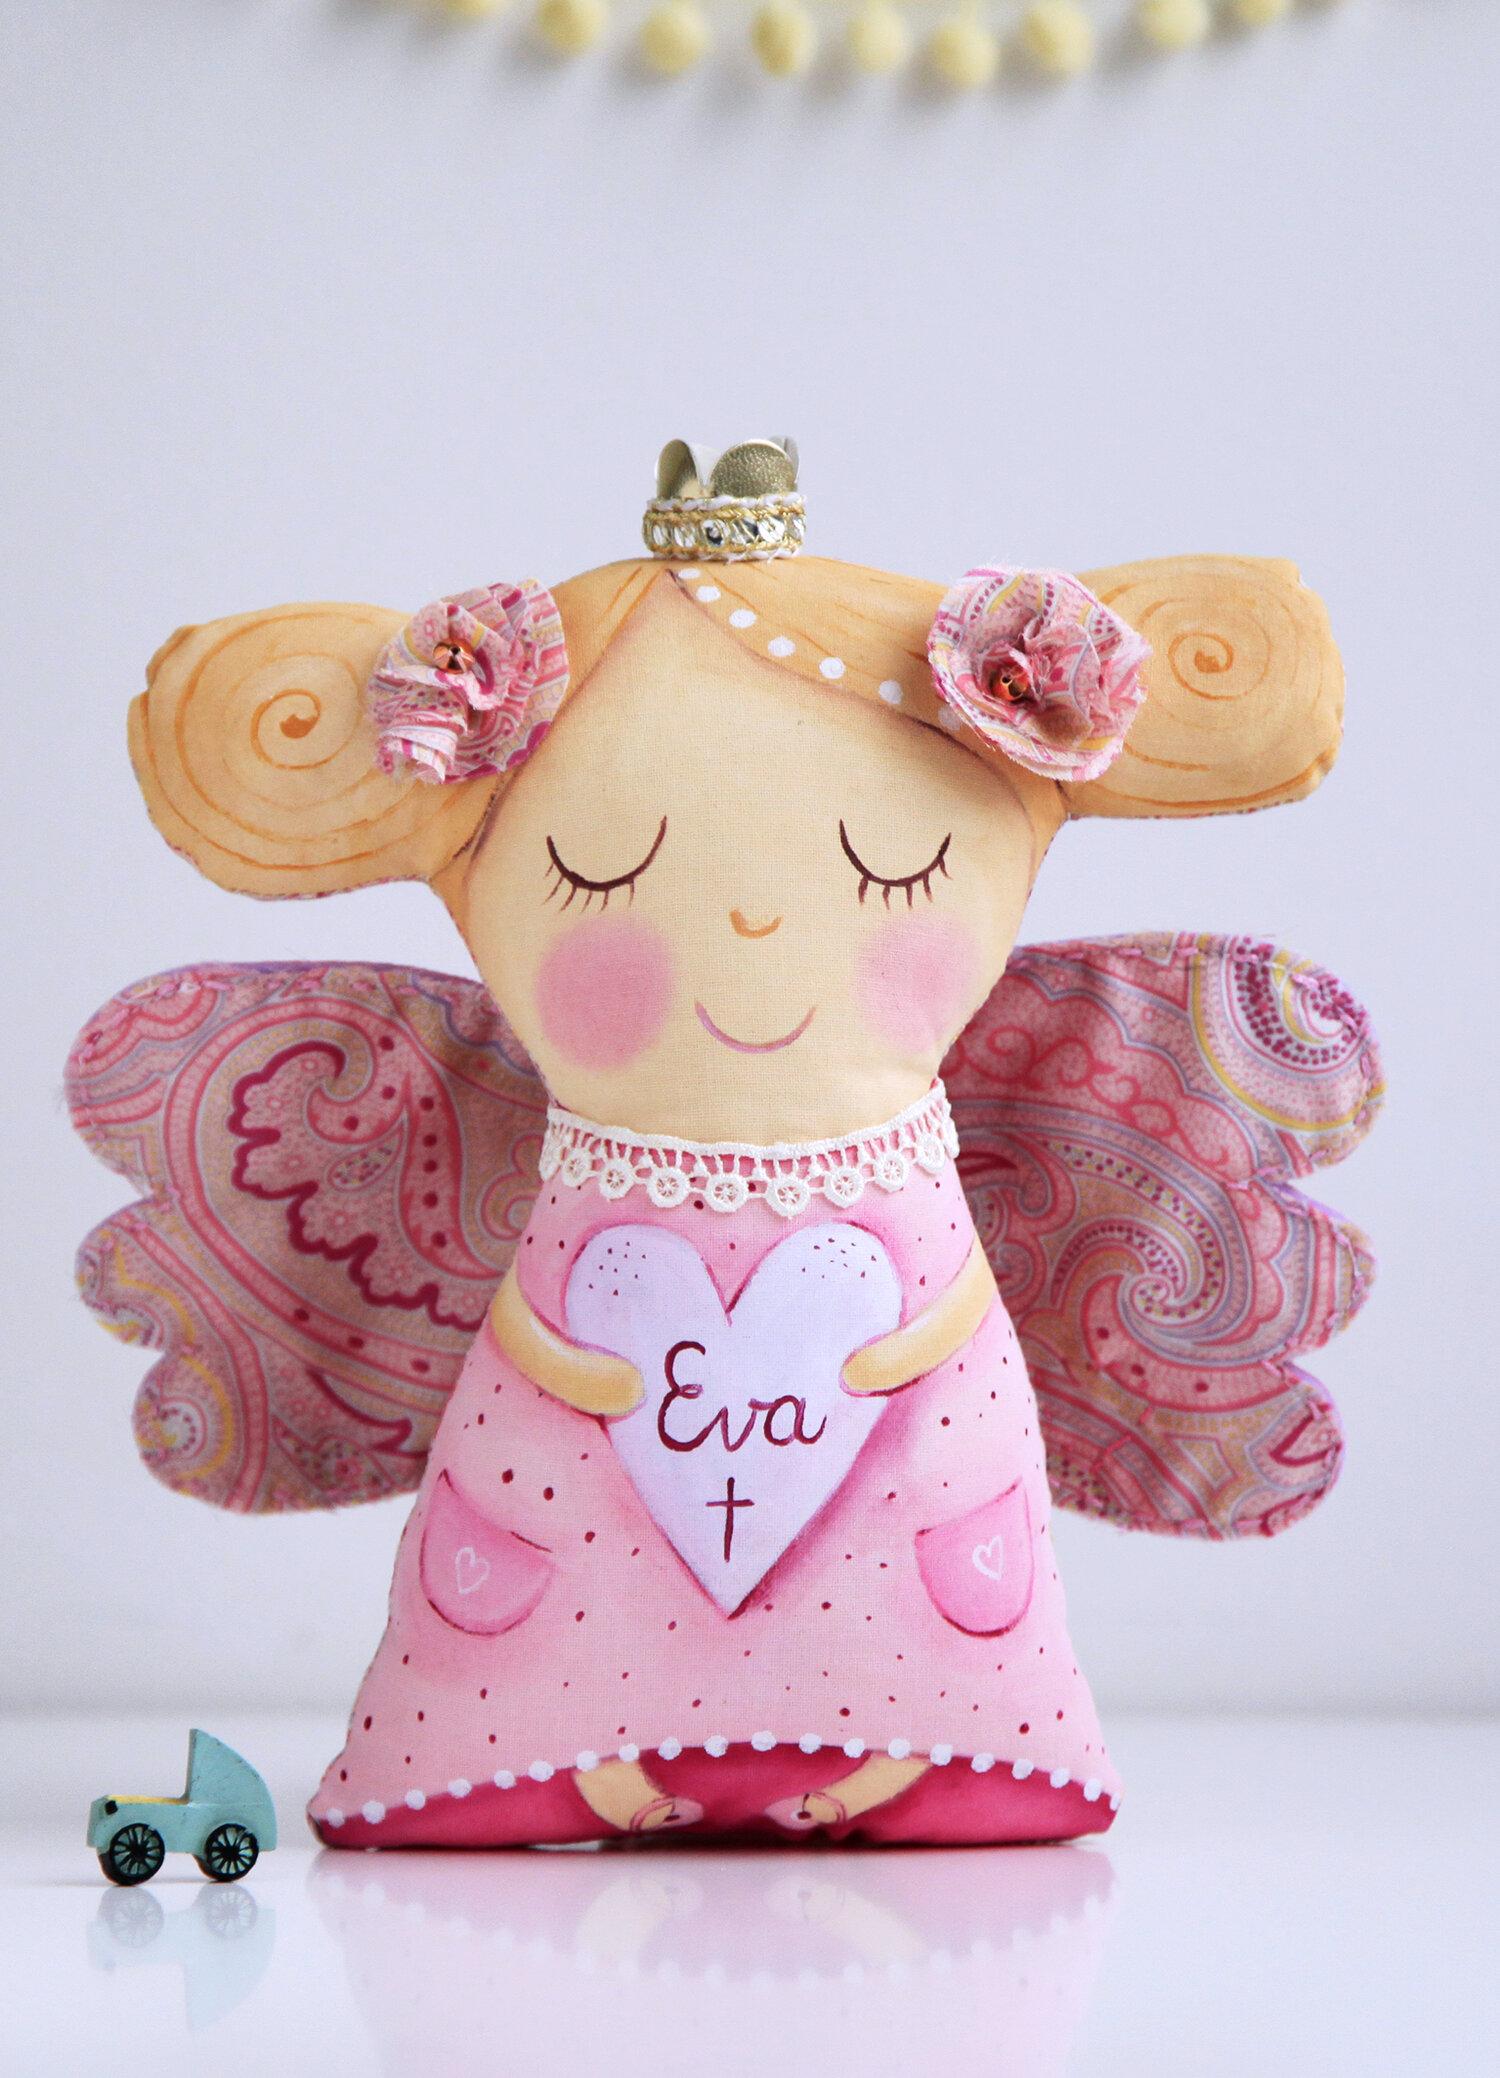 Eva_doll_angel_2.jpg